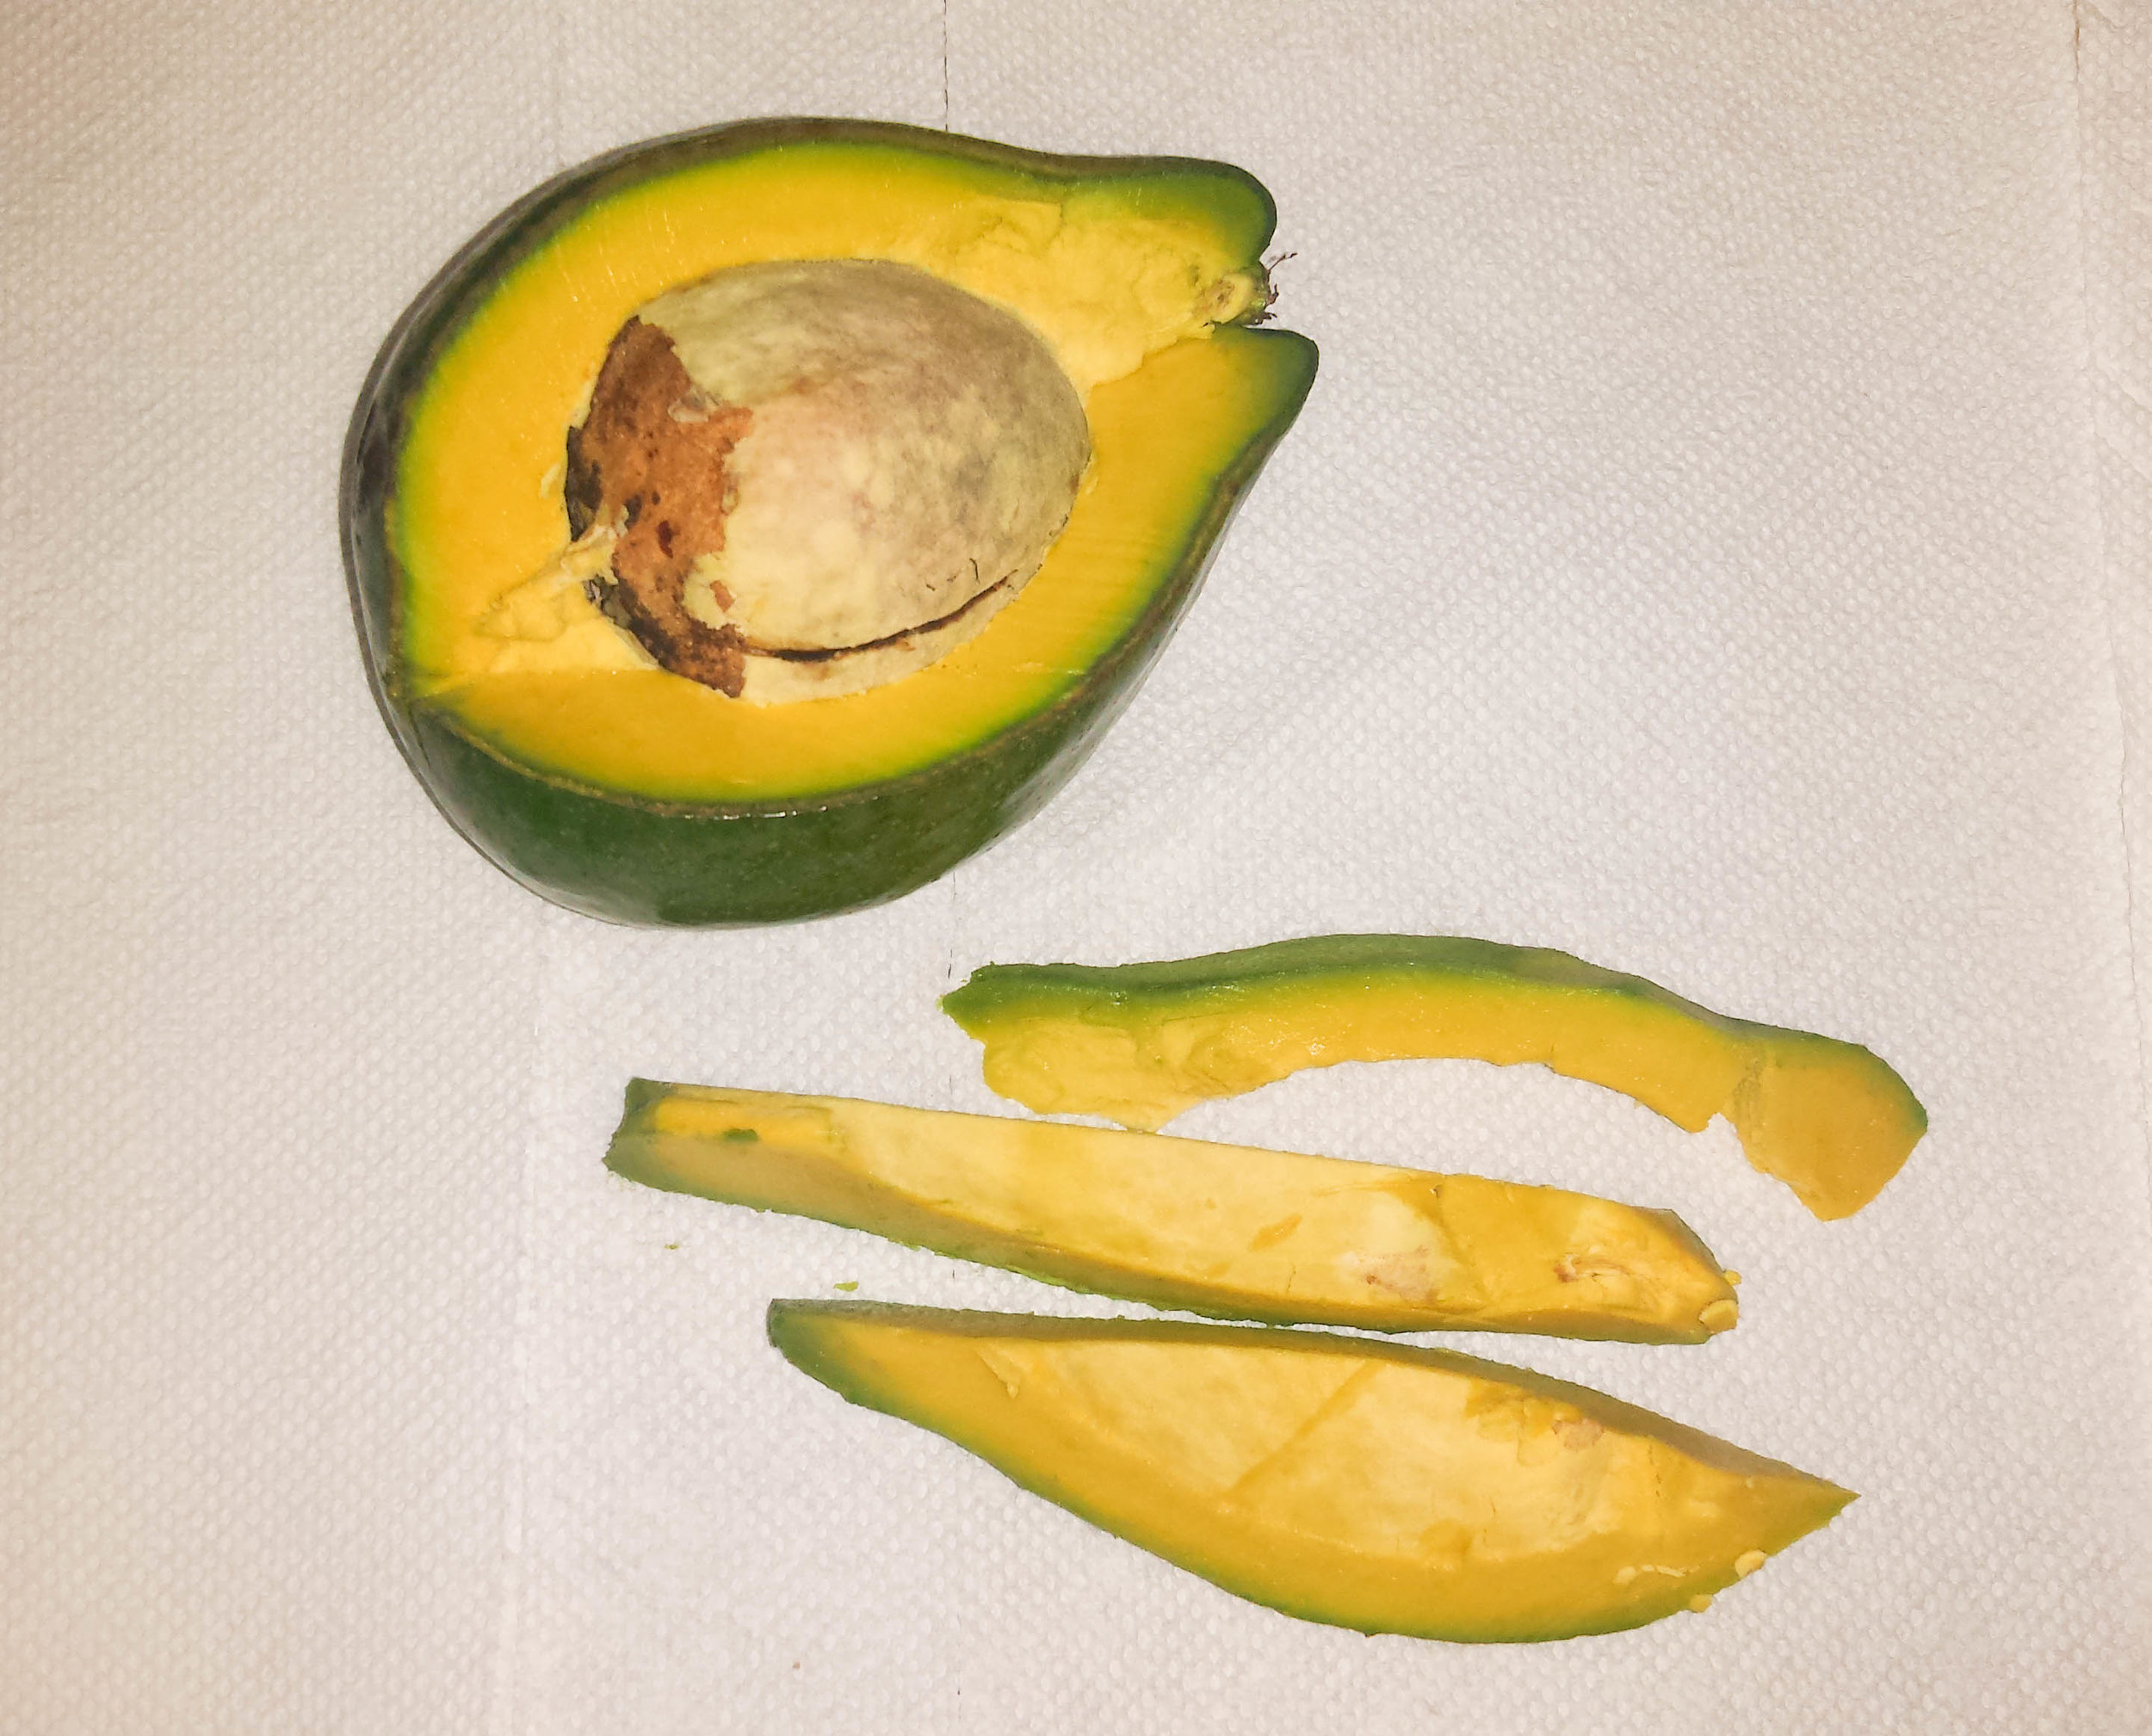 Step 1: Cut Avocado